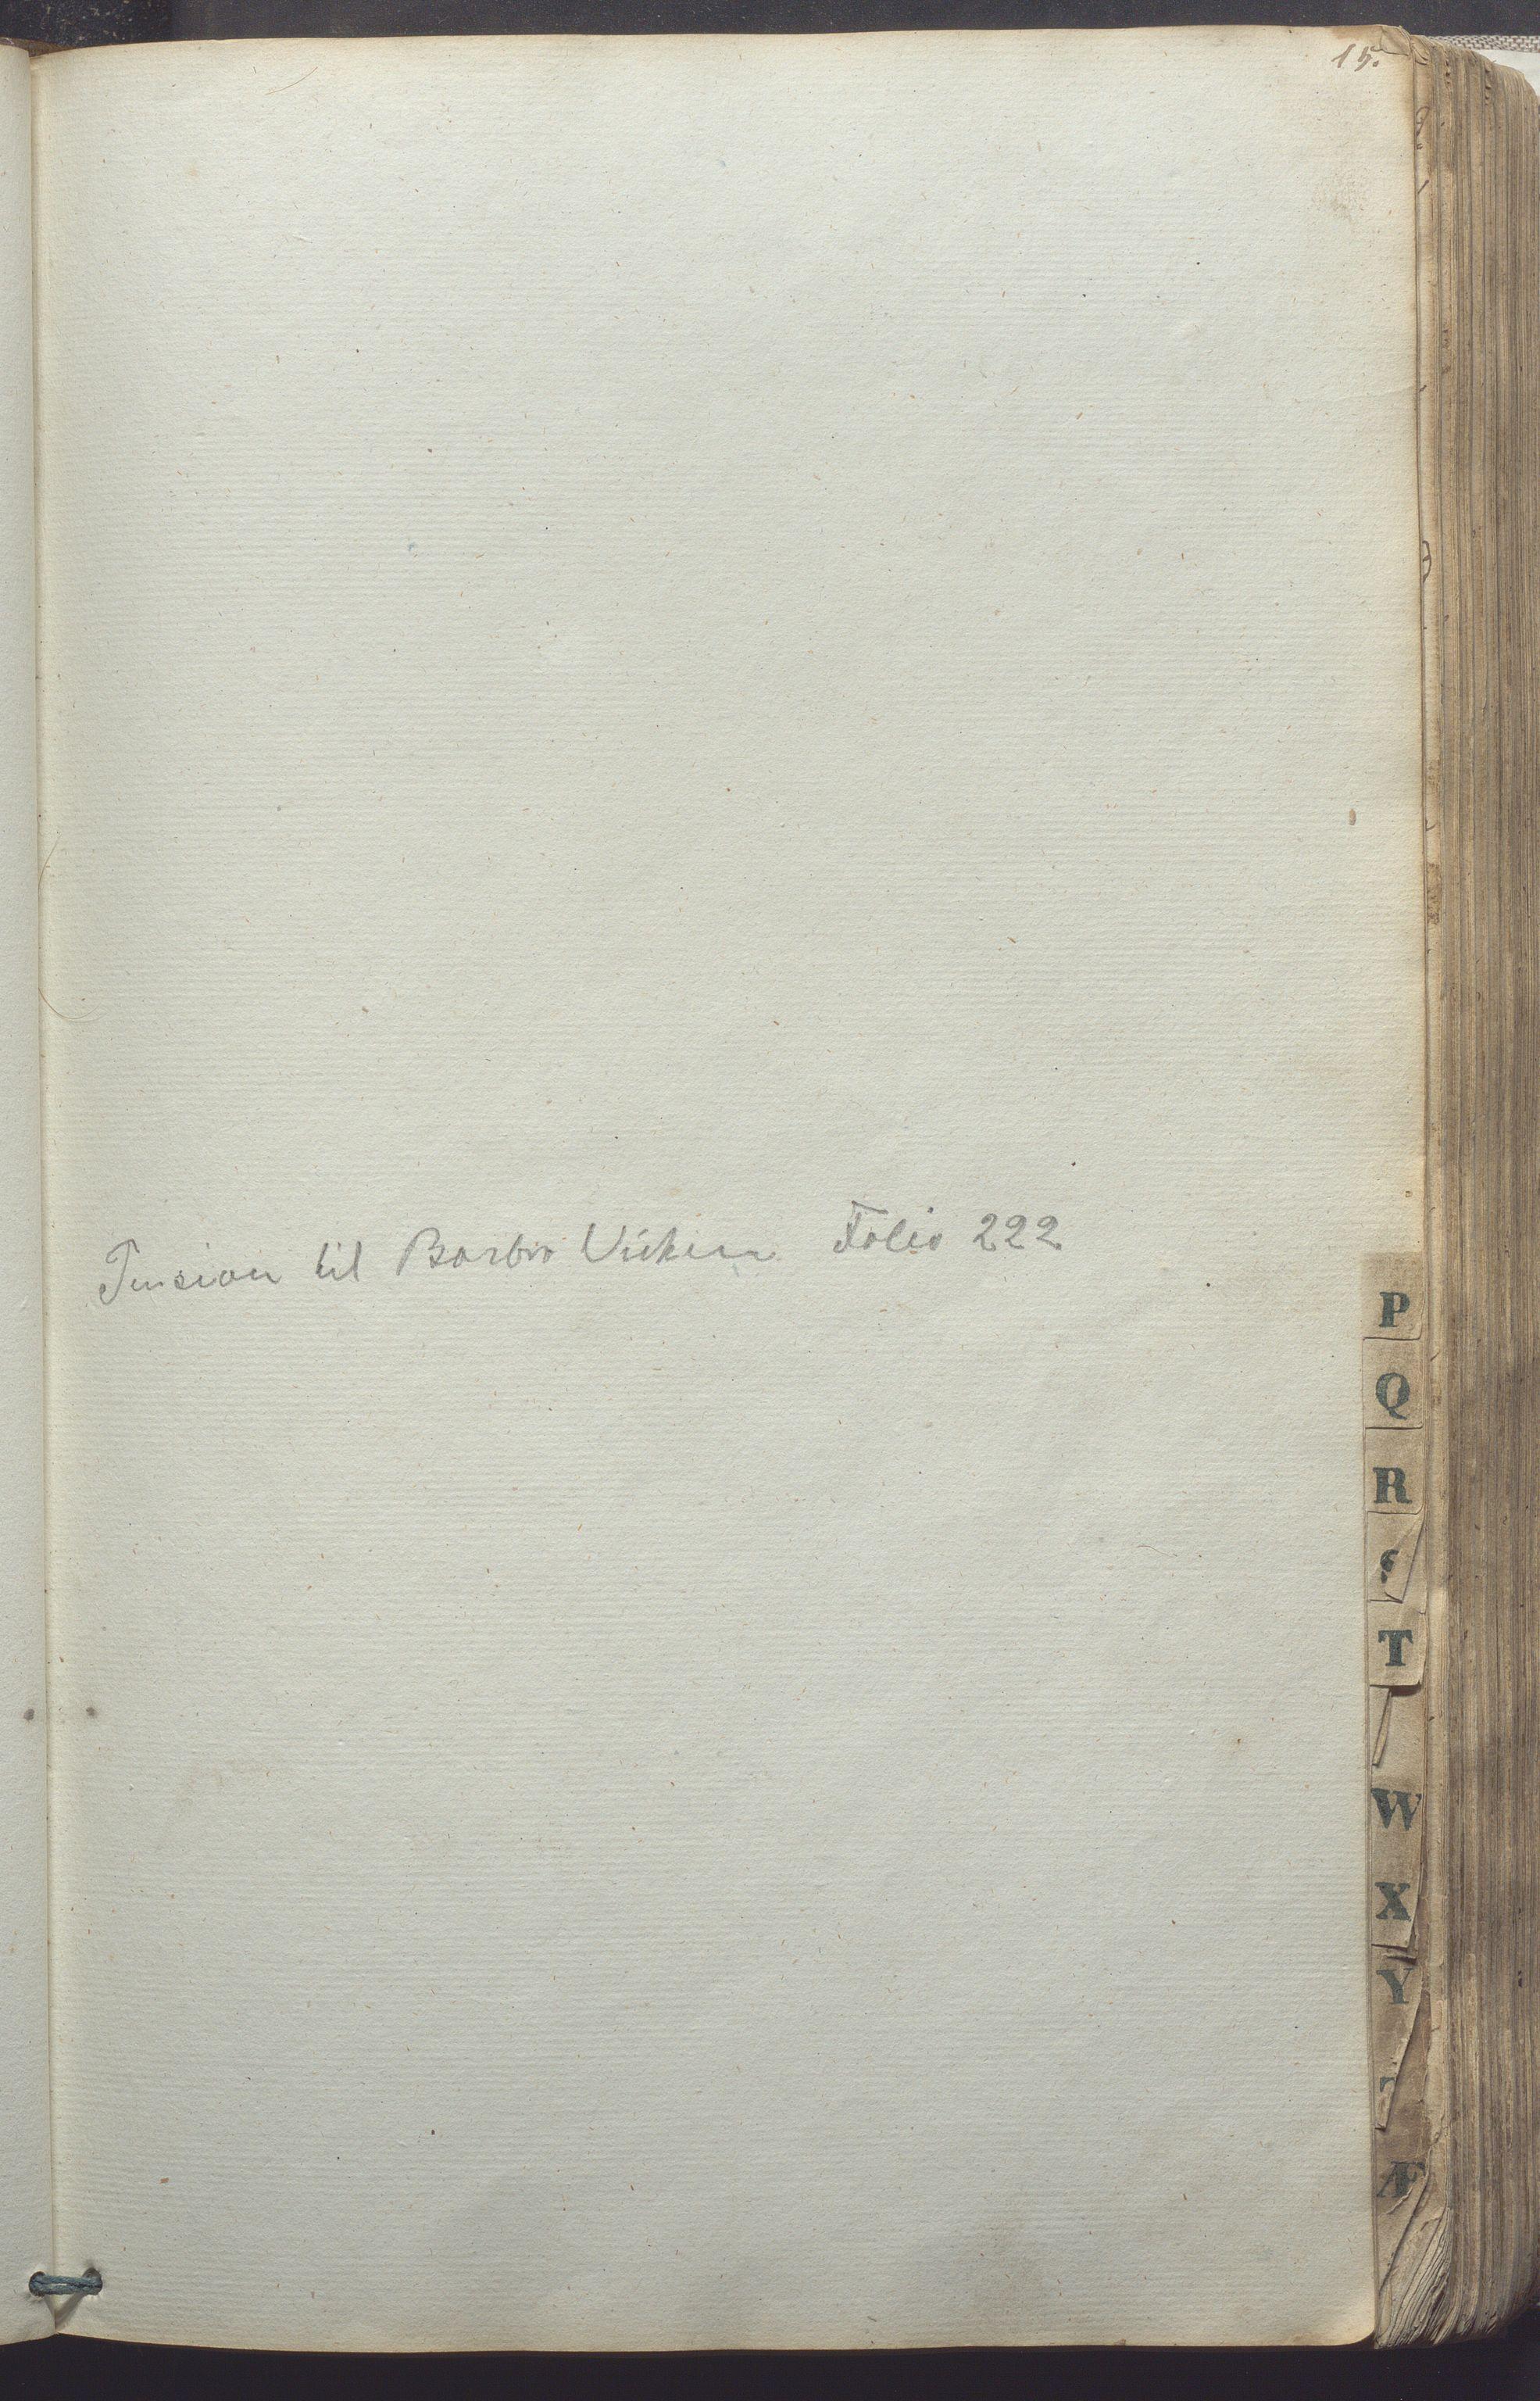 IKAR, Suldal kommune - Formannskapet/Rådmannen, A/Aa/L0001: Møtebok, 1837-1876, s. 15a